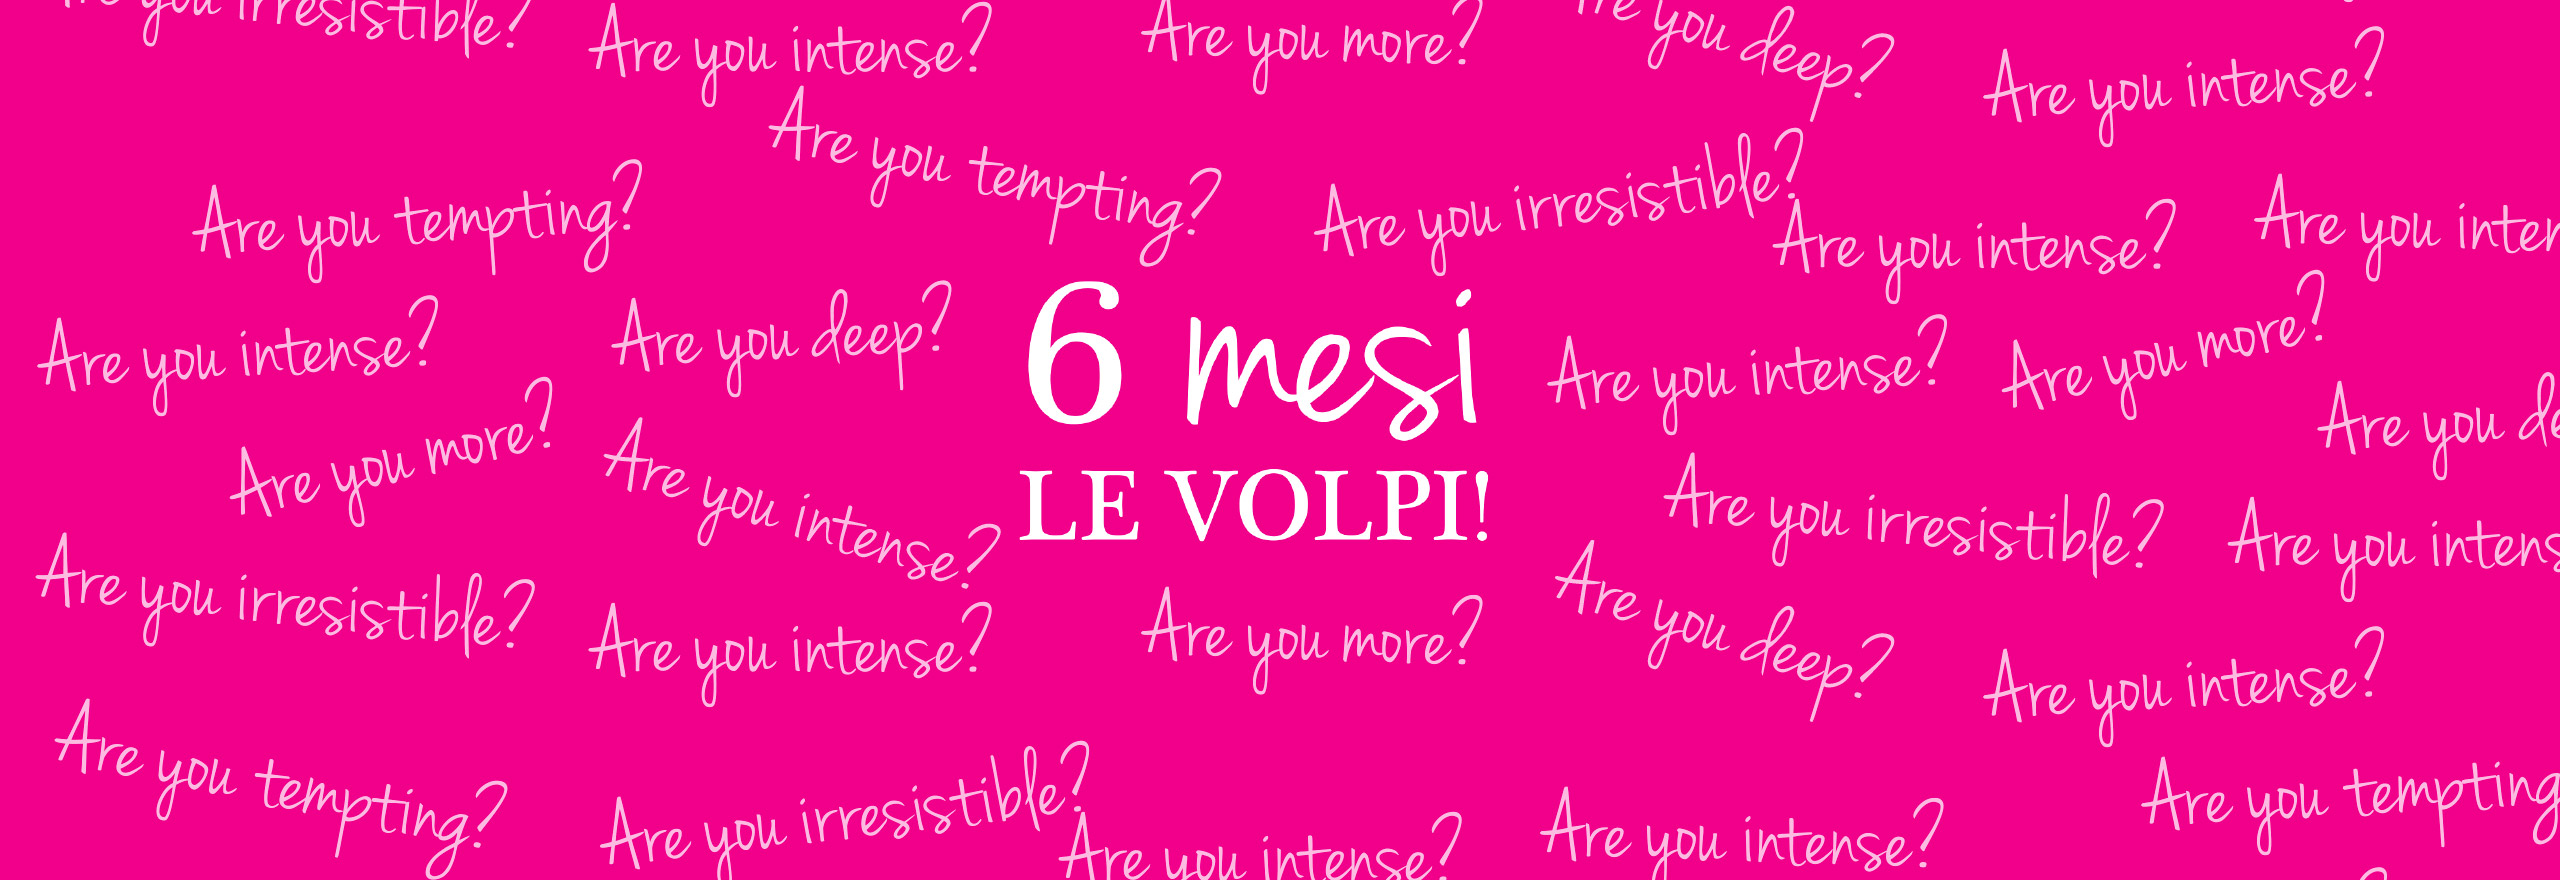 6-mesi-rosso-veneto-igt-colli-euganei_en